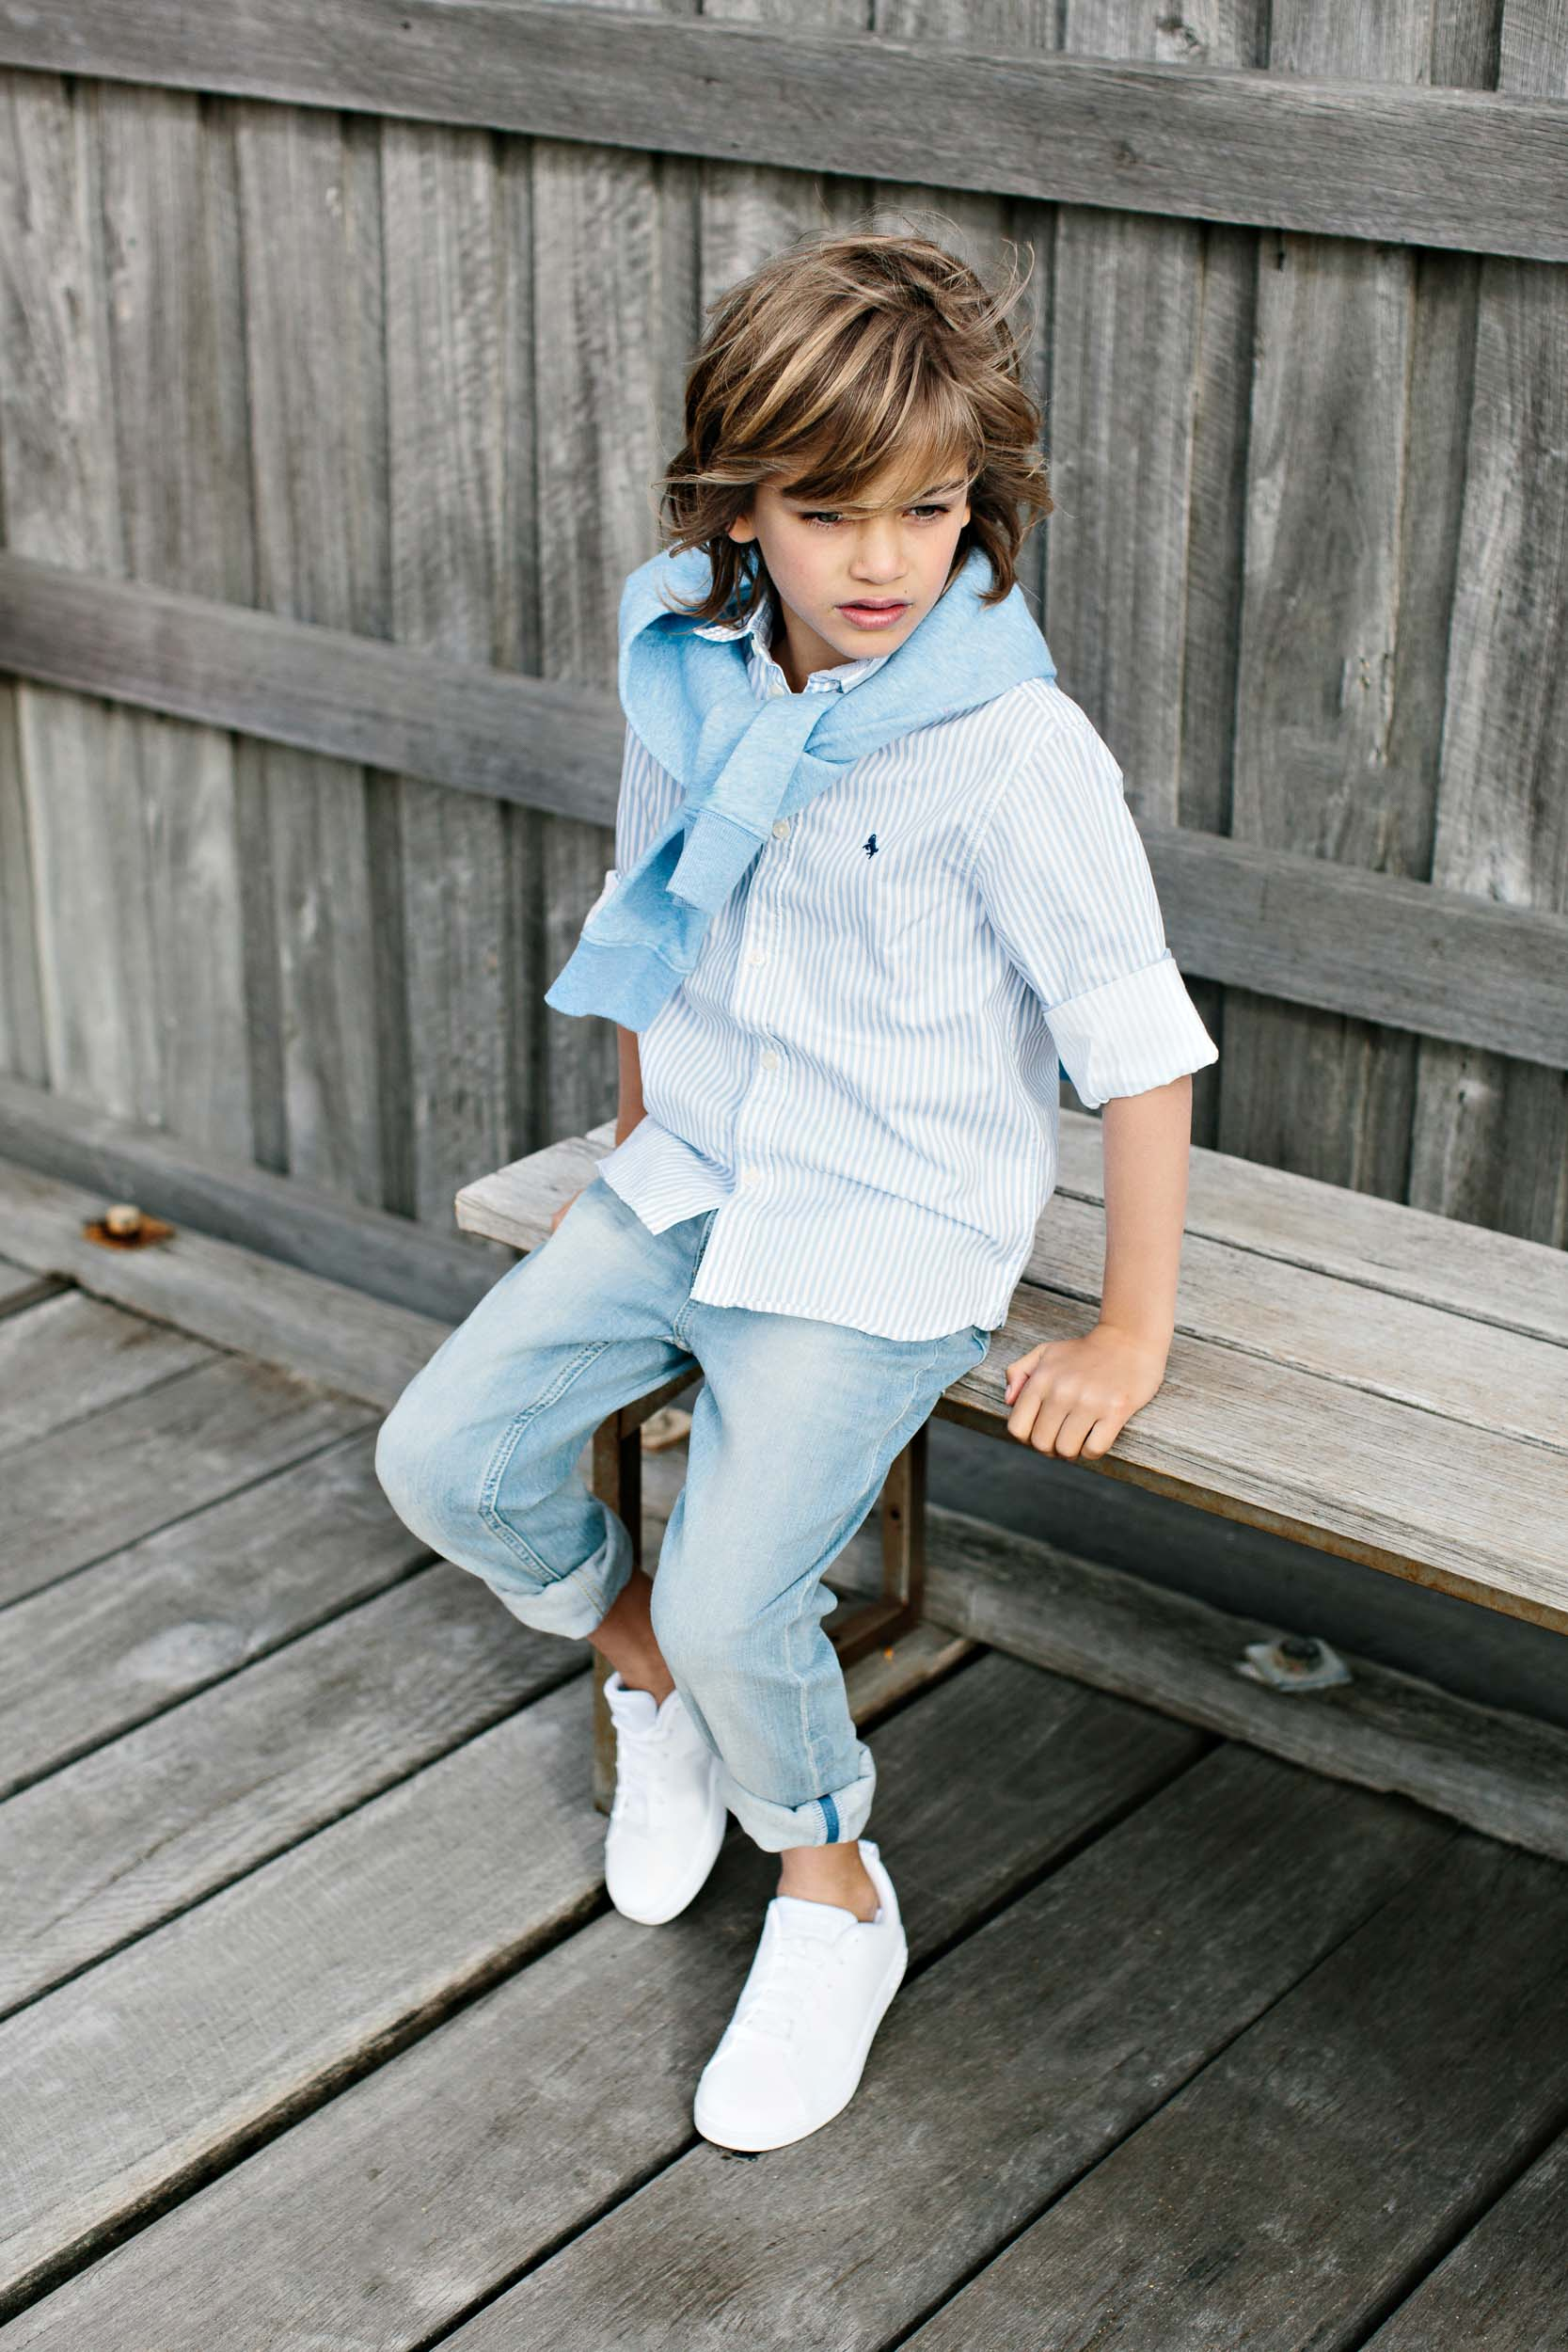 Kas-Richards-LENZO_Betts-Kids-Shoes-280.jpg